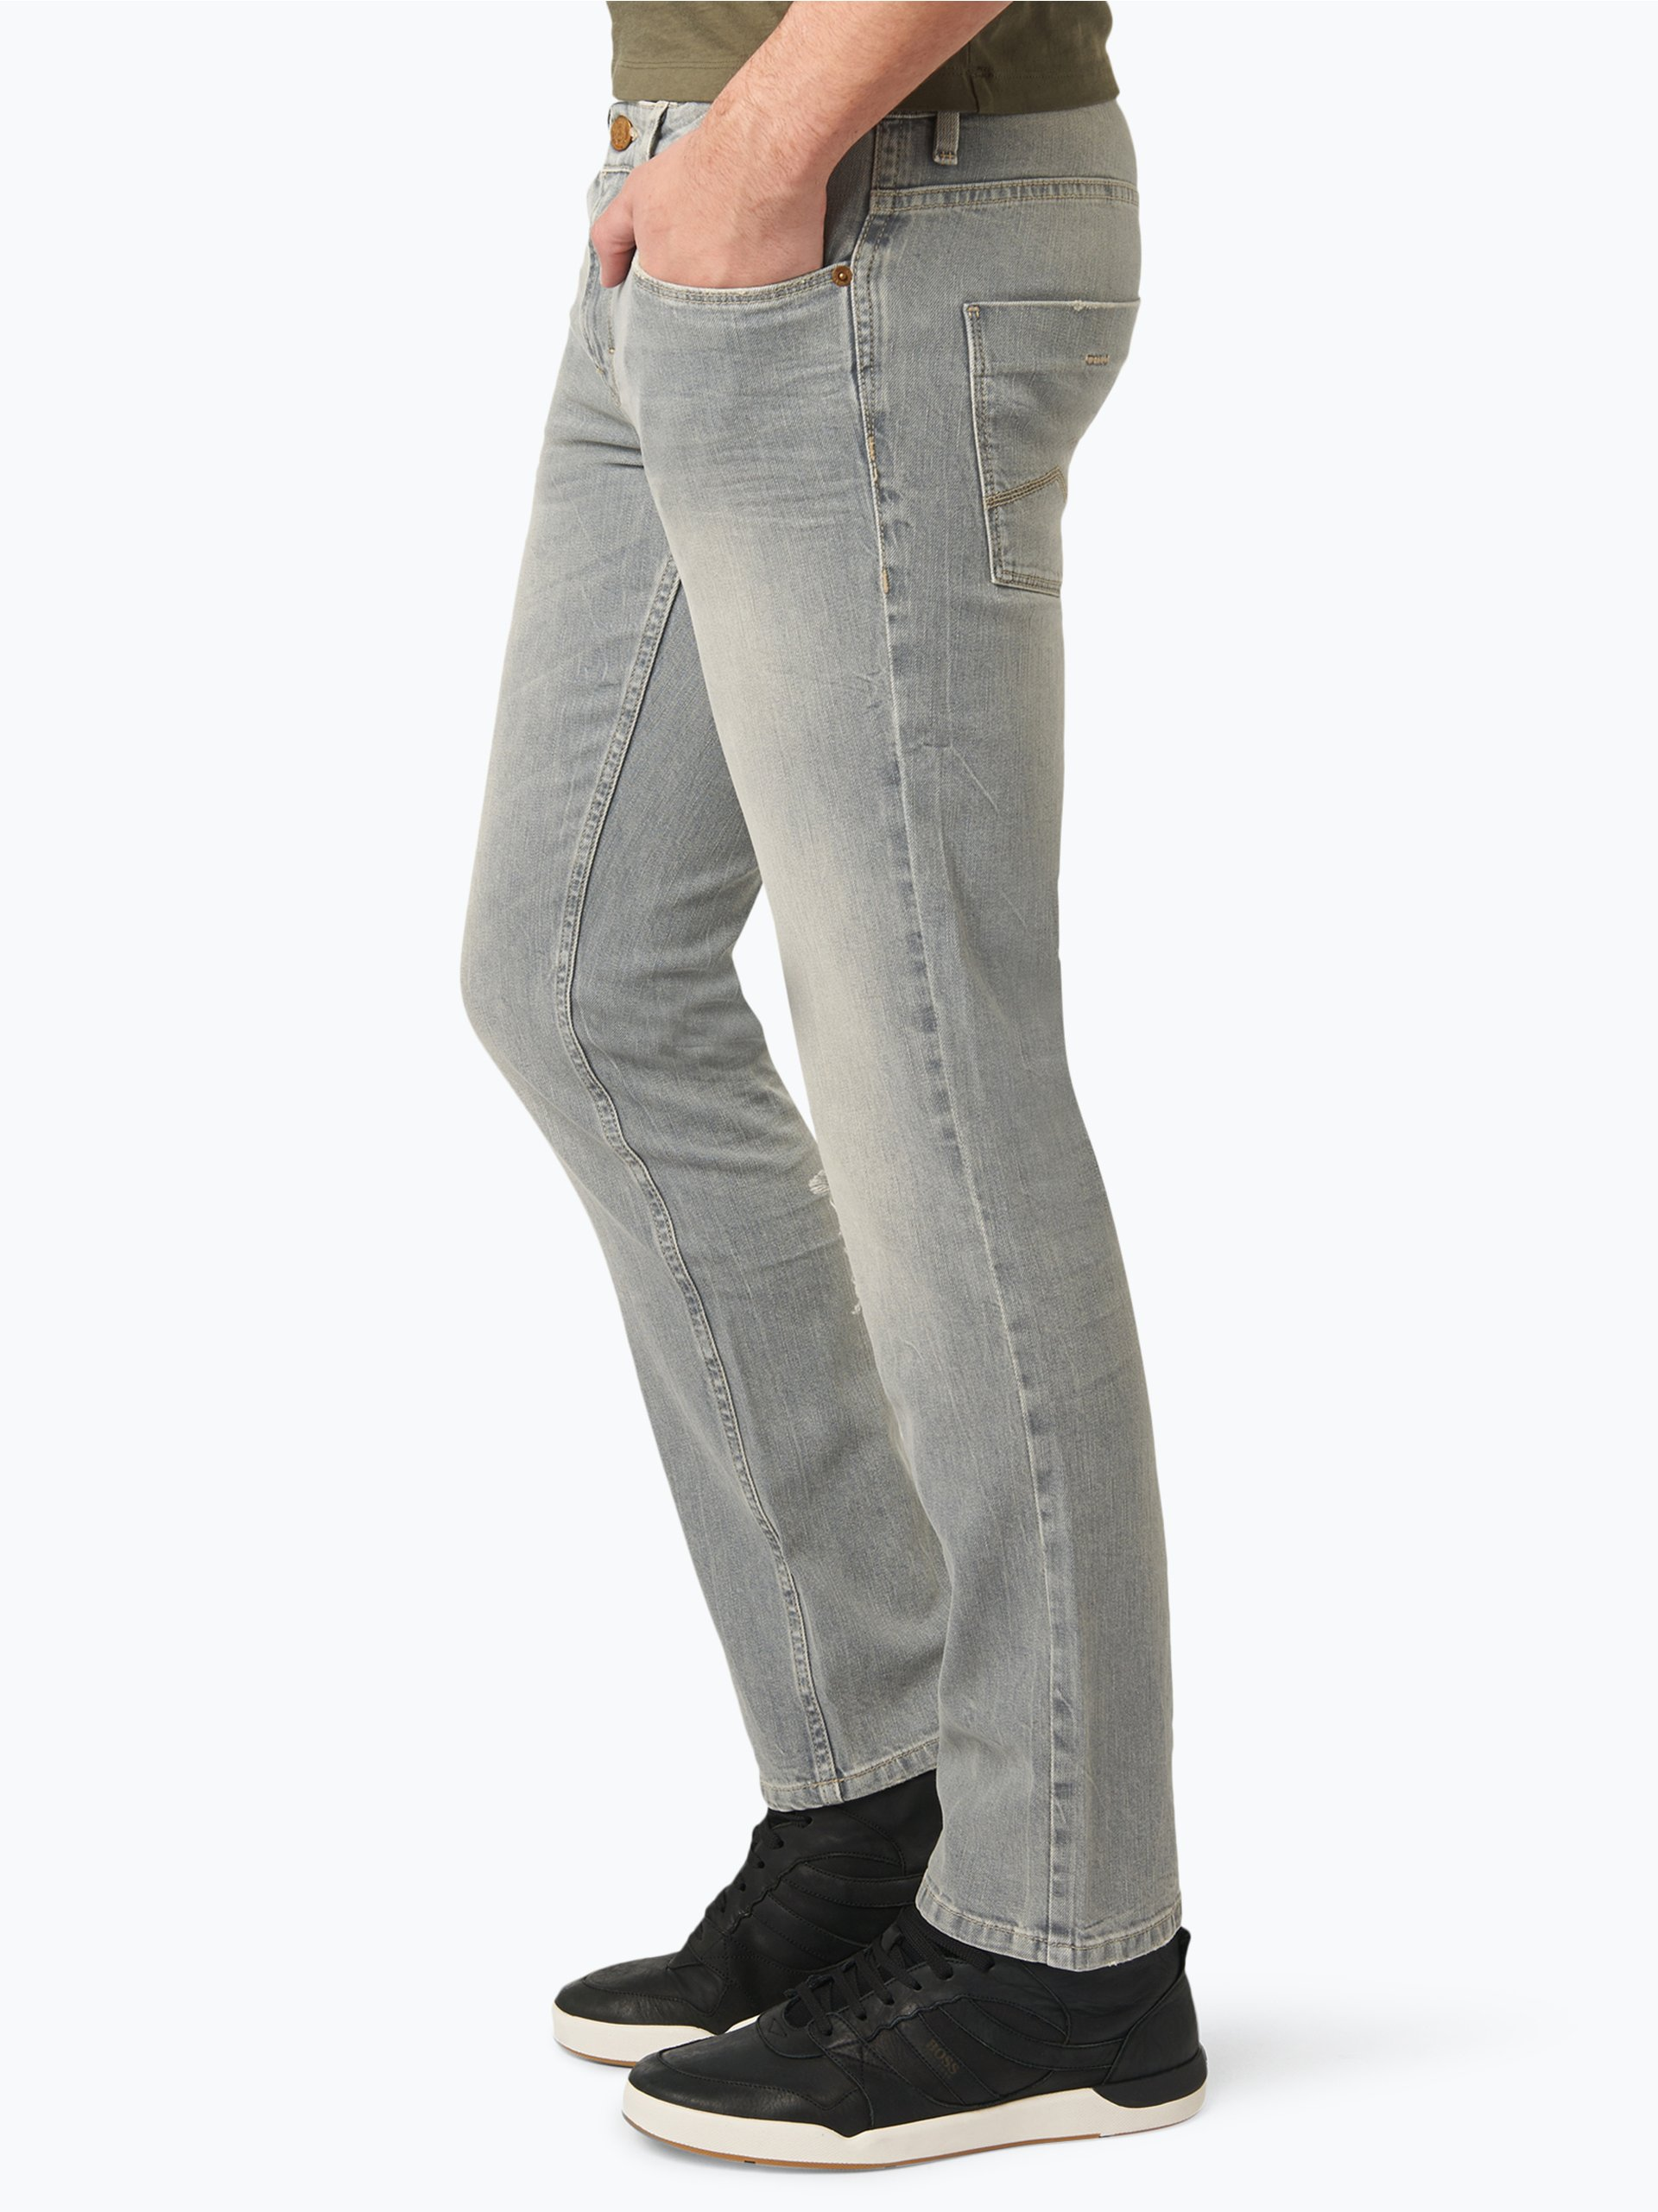 boss casual herren jeans orange 63 grau uni online kaufen vangraaf com. Black Bedroom Furniture Sets. Home Design Ideas